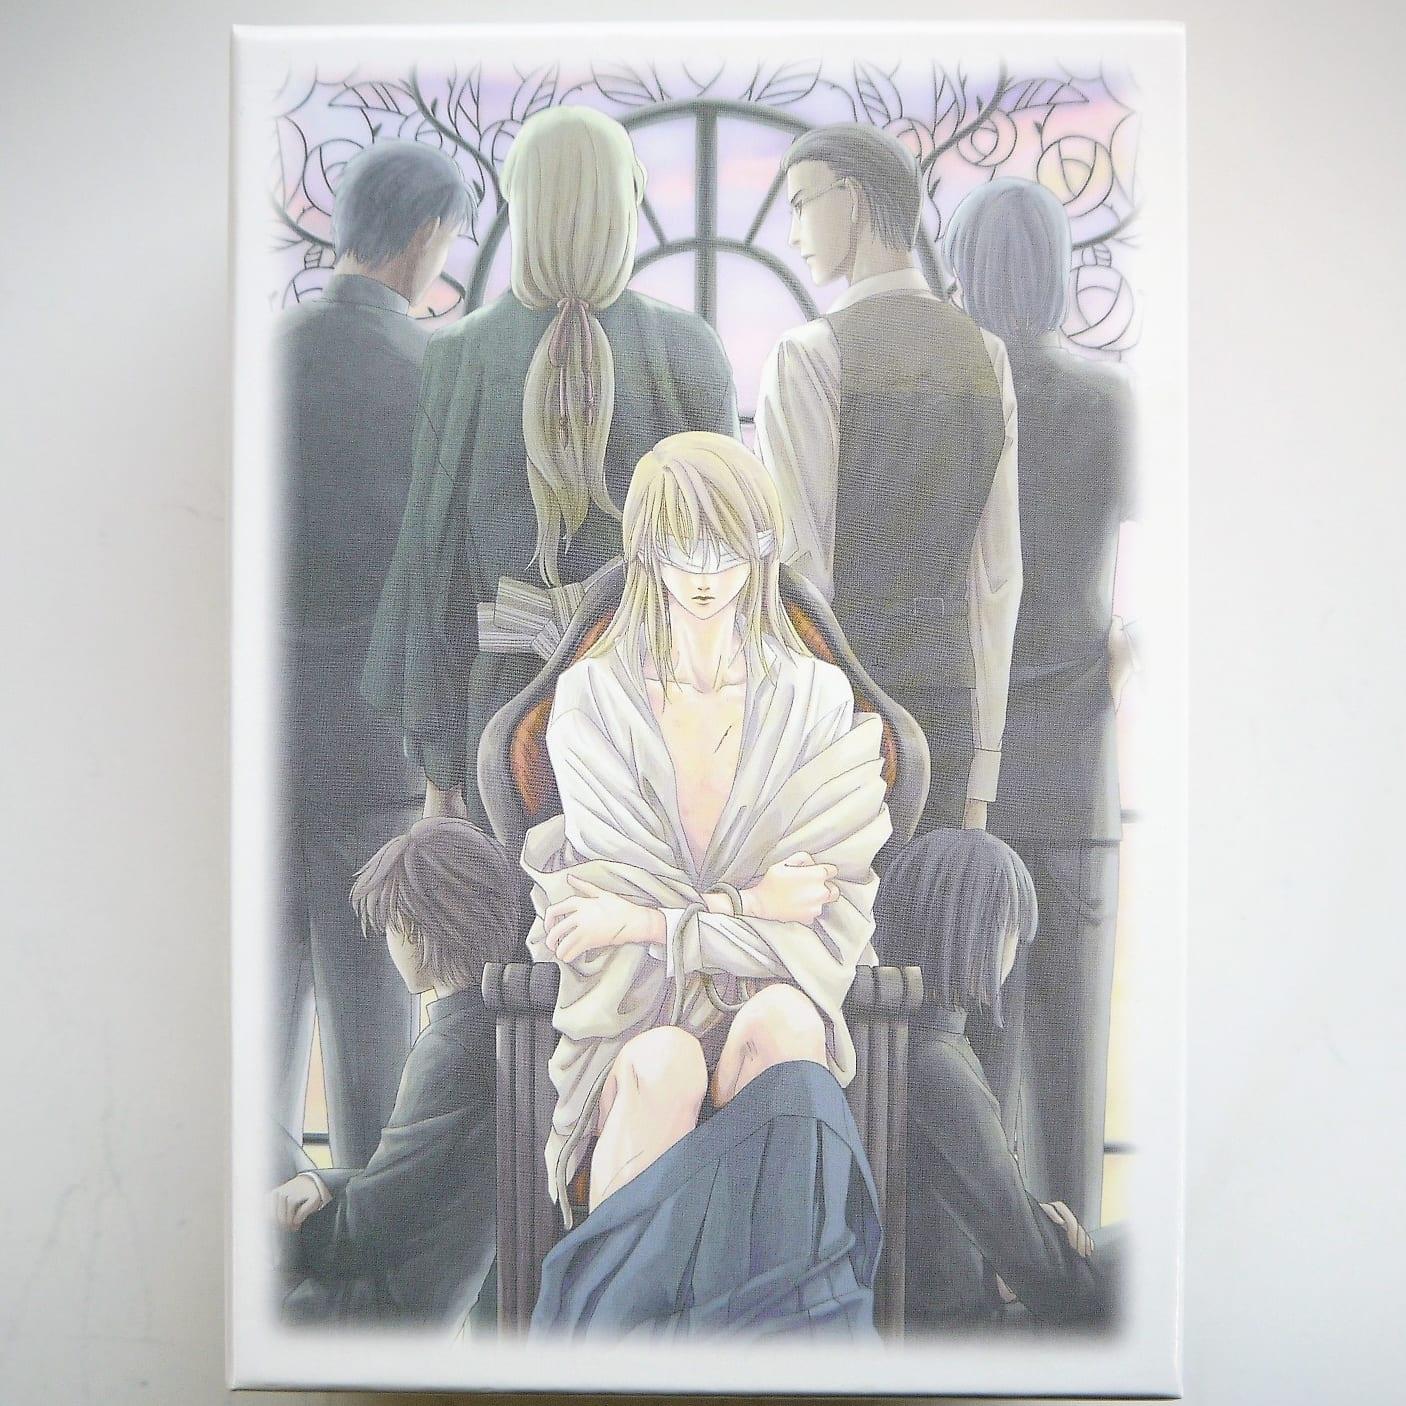 【BLゲーム高価買取】薔薇ノ木ニ薔薇ノ花咲ク[愛蔵版]